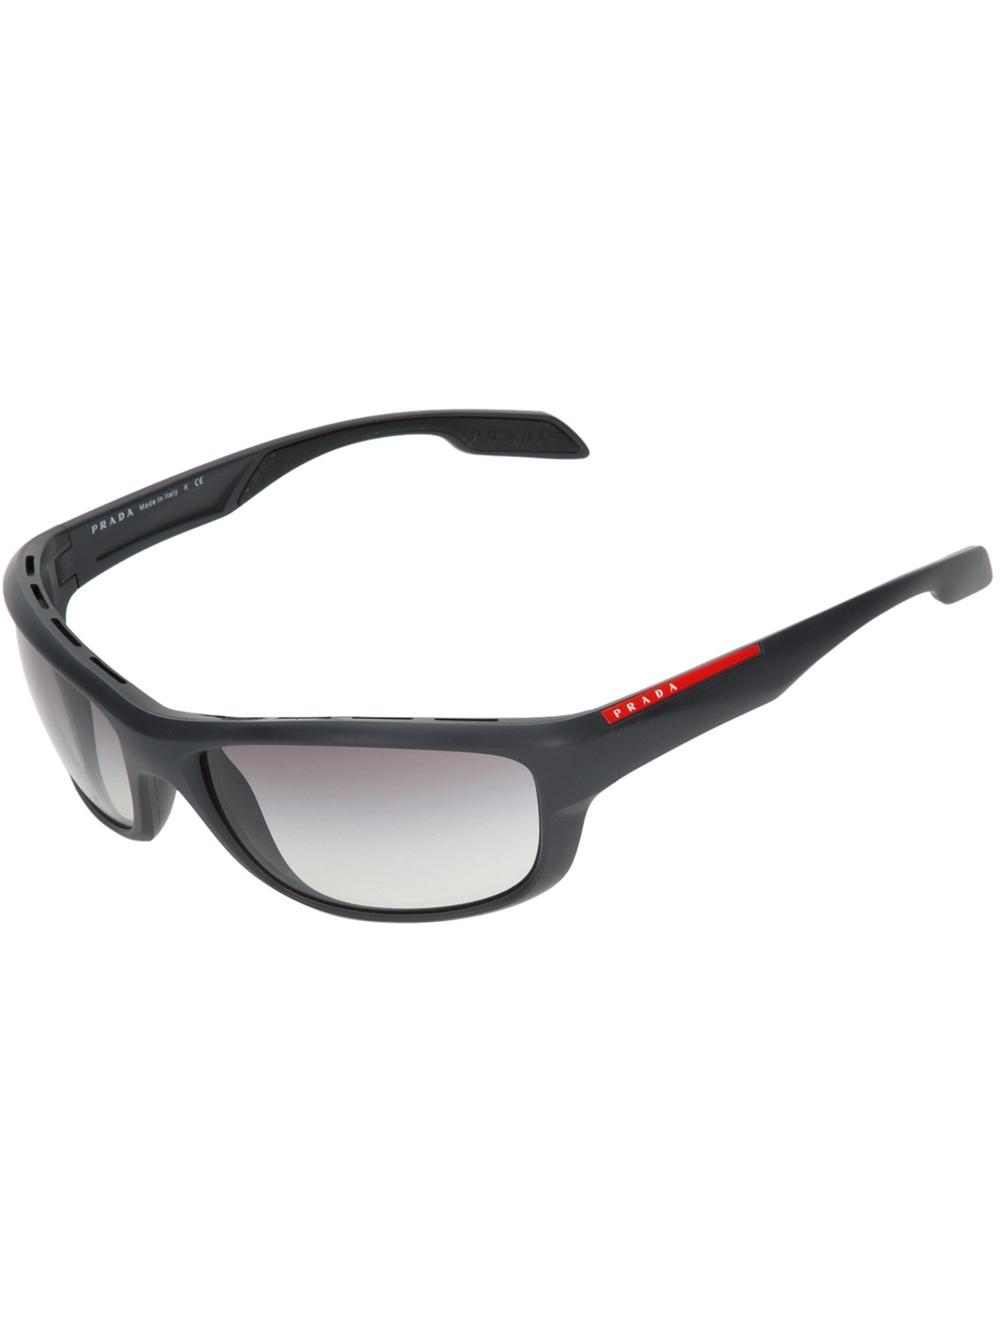 358b80716fe0 discount prada pr57ls 5av3m1 sunglasses shade station f72b1 41c72  sweden prada  wrap around sunglasses in gray for men lyst 1a844 8e801